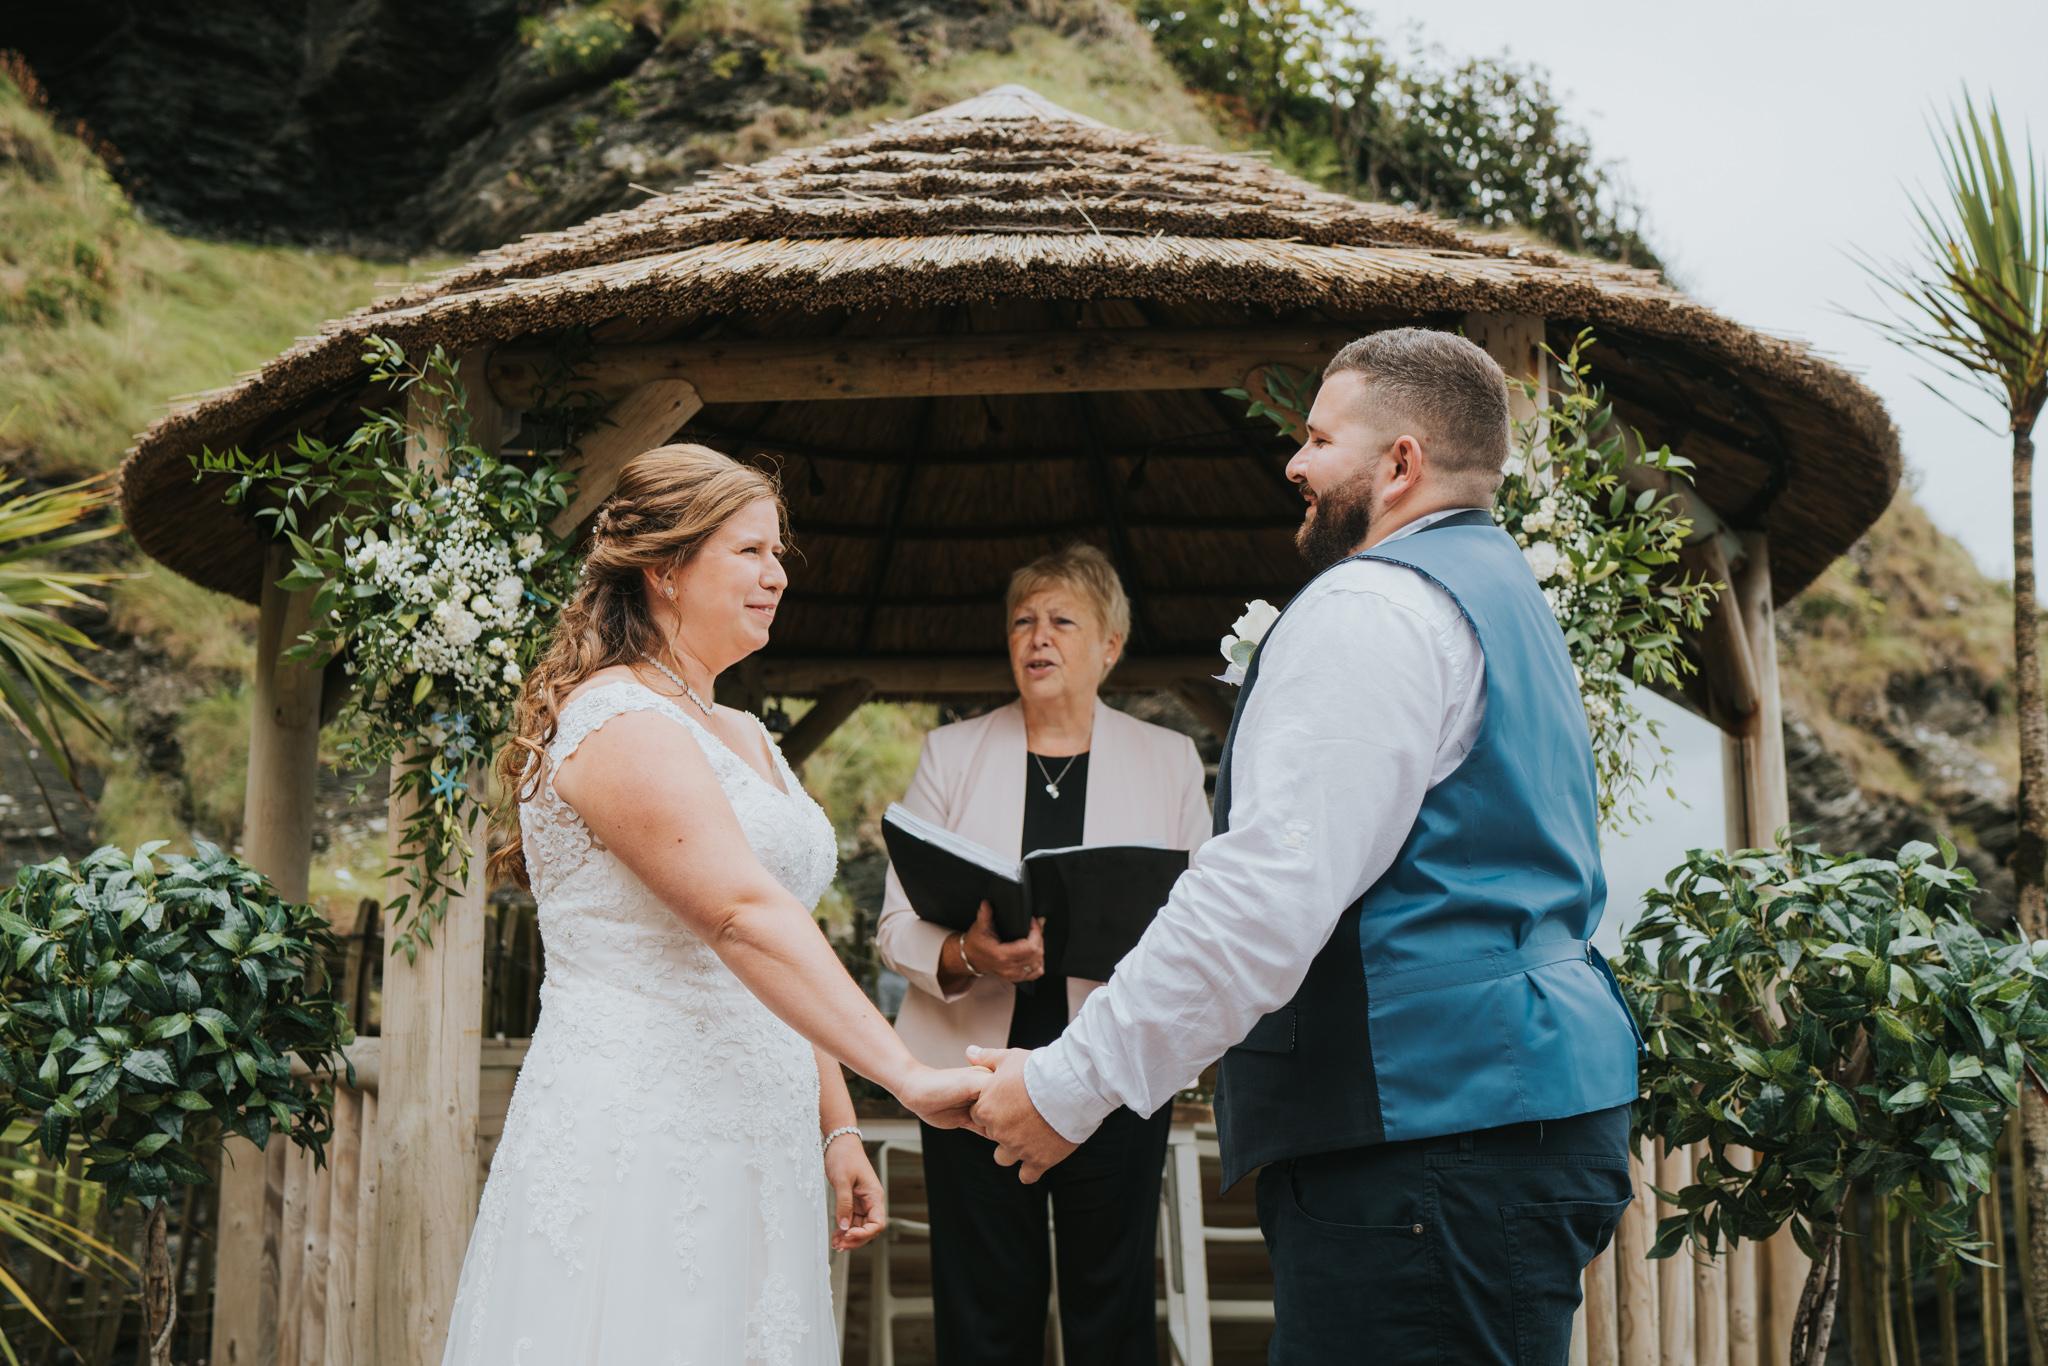 john-amy-relaxed-beach-wedding-tunnels-beaches-ilfracombe-north-devon-grace-elizabeth-colchester-essex-alternative-relaxed-wedding-photography-devon-suffolk-norfolk-essex (58 of 159).jpg